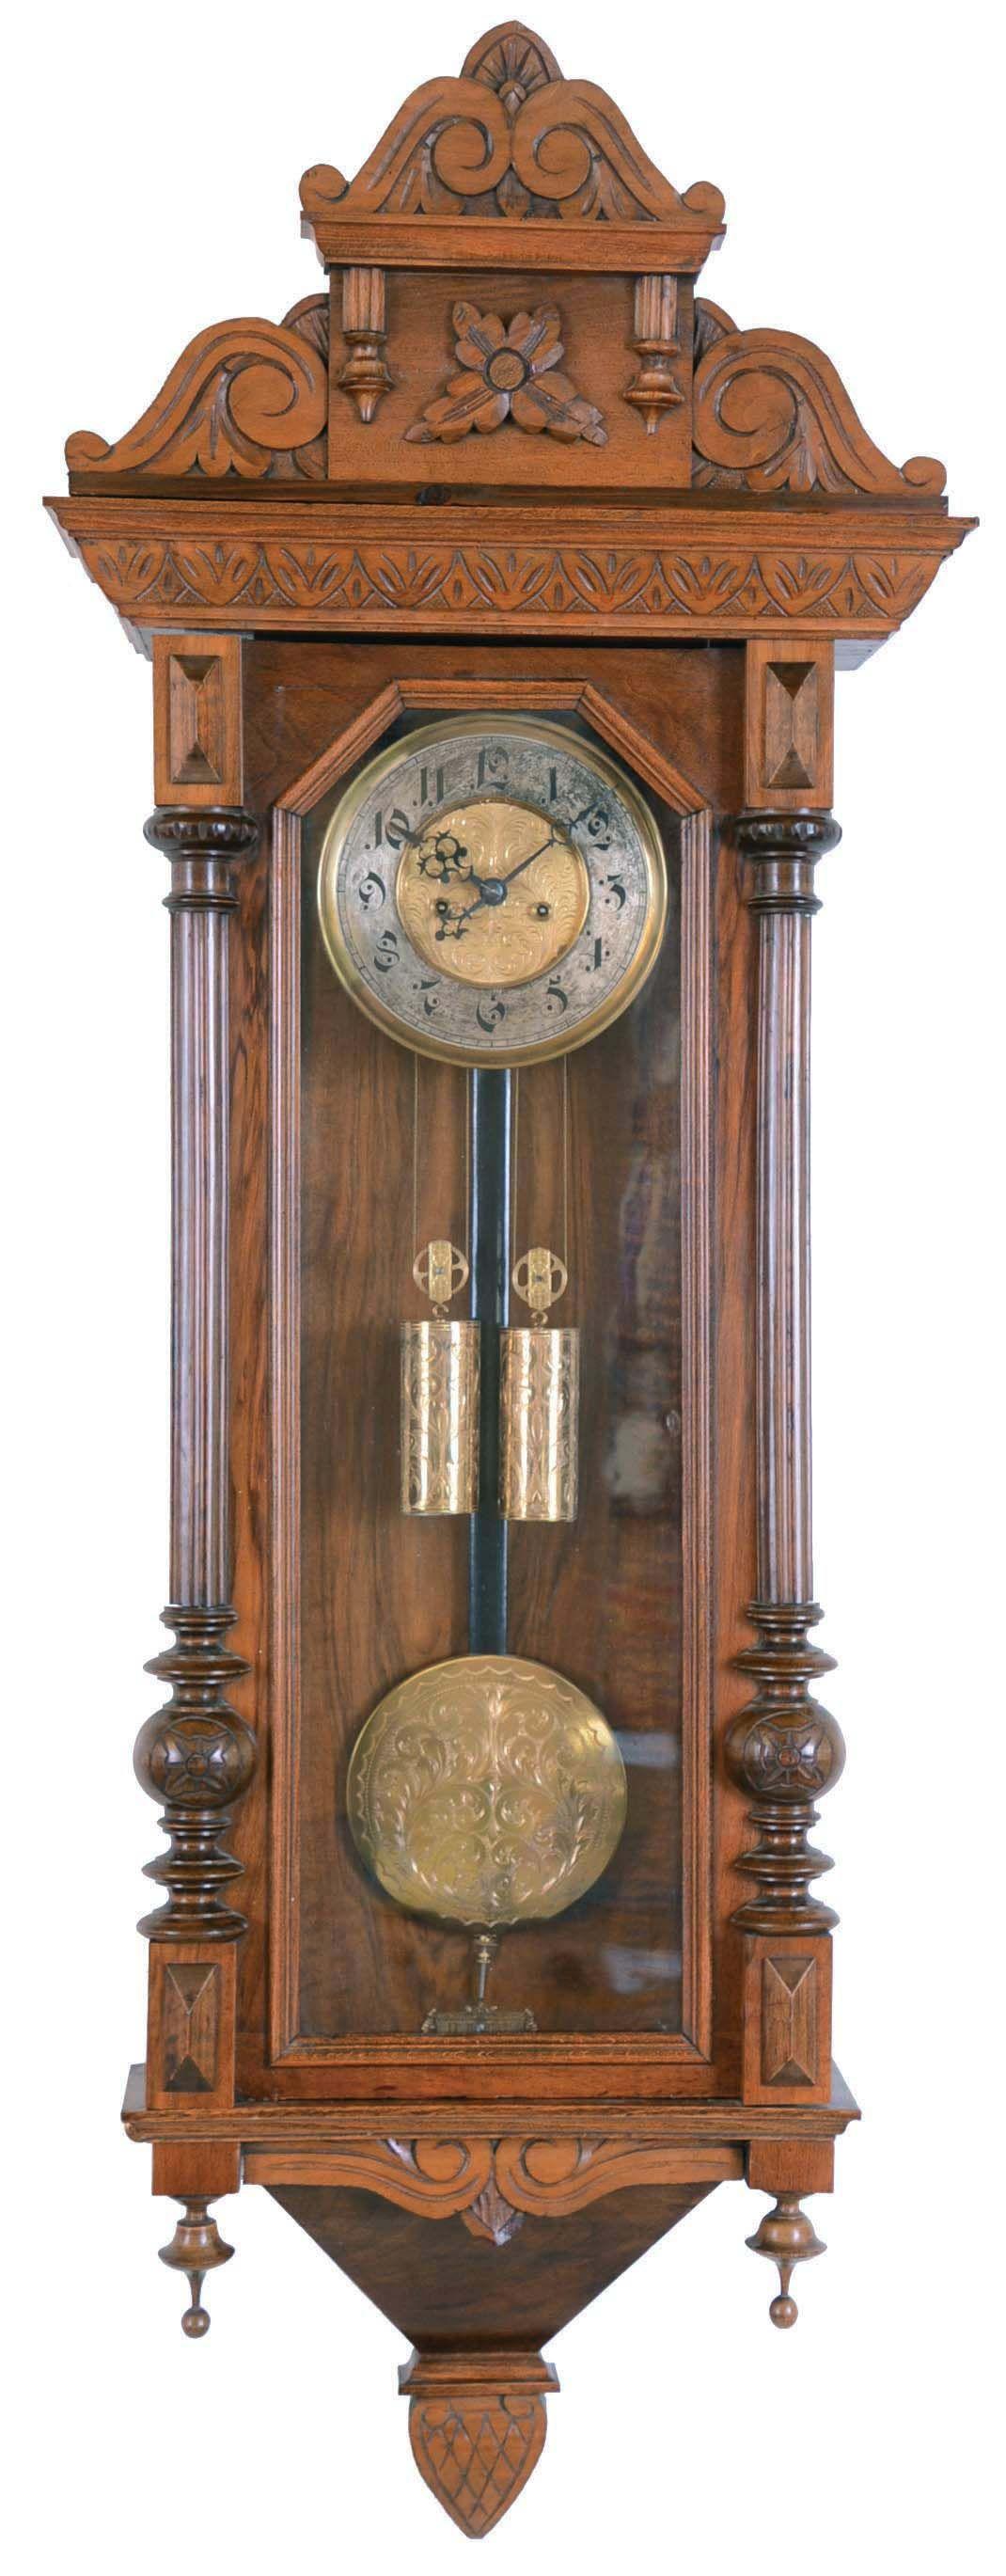 15505 A Jpg Obraz Jpeg 1070 2739 Pikseli Skala 21 Alte Uhren Uhren